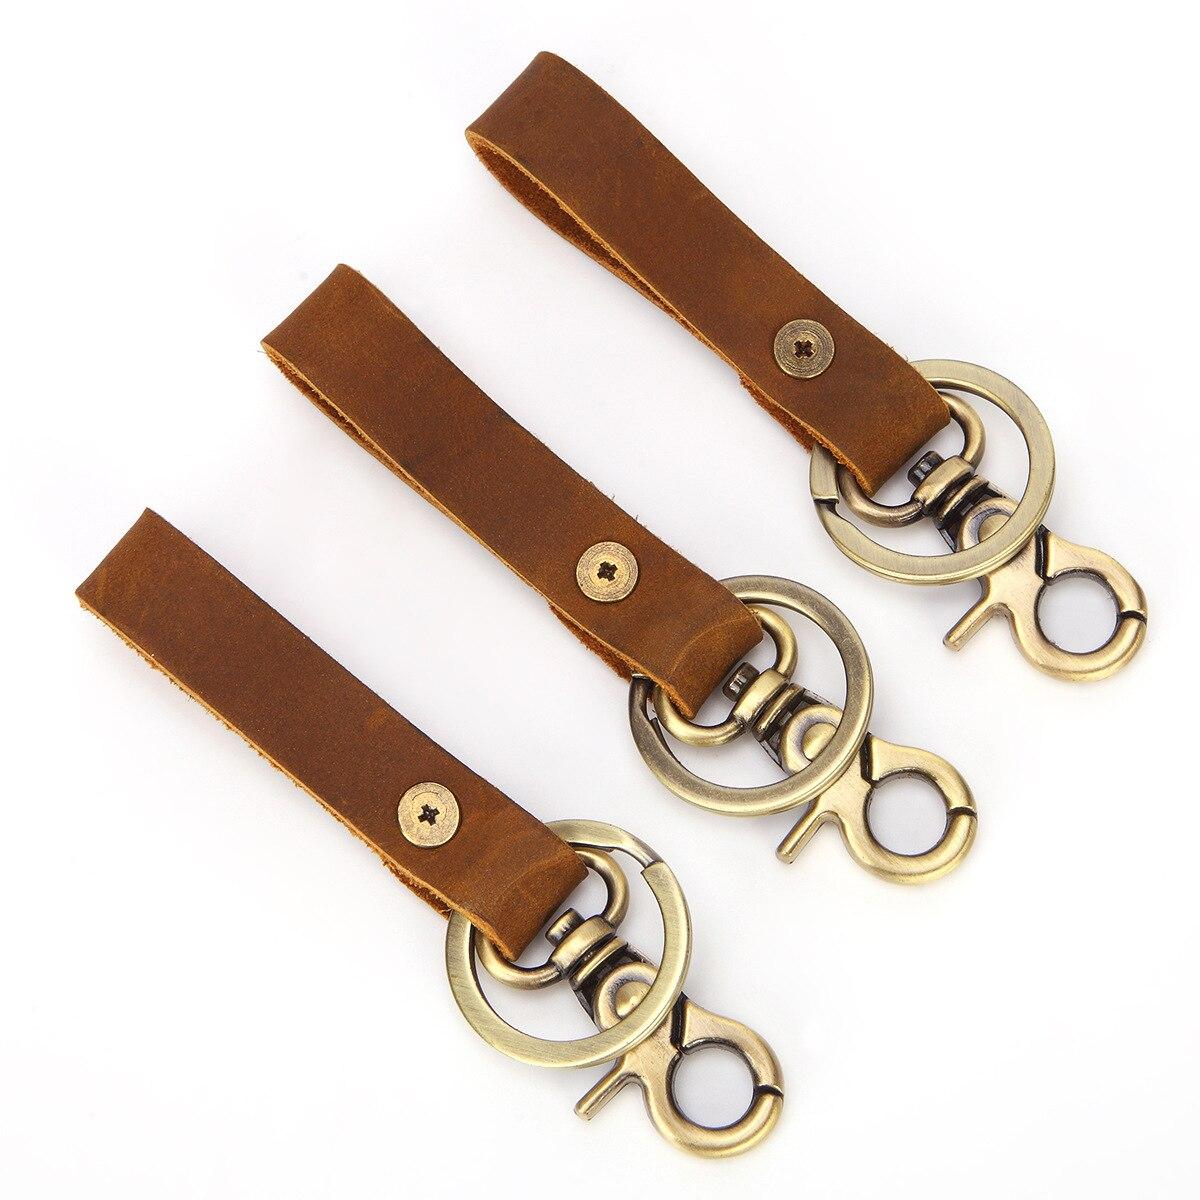 Diamond Plate Genuine Leather Keychain Personalized